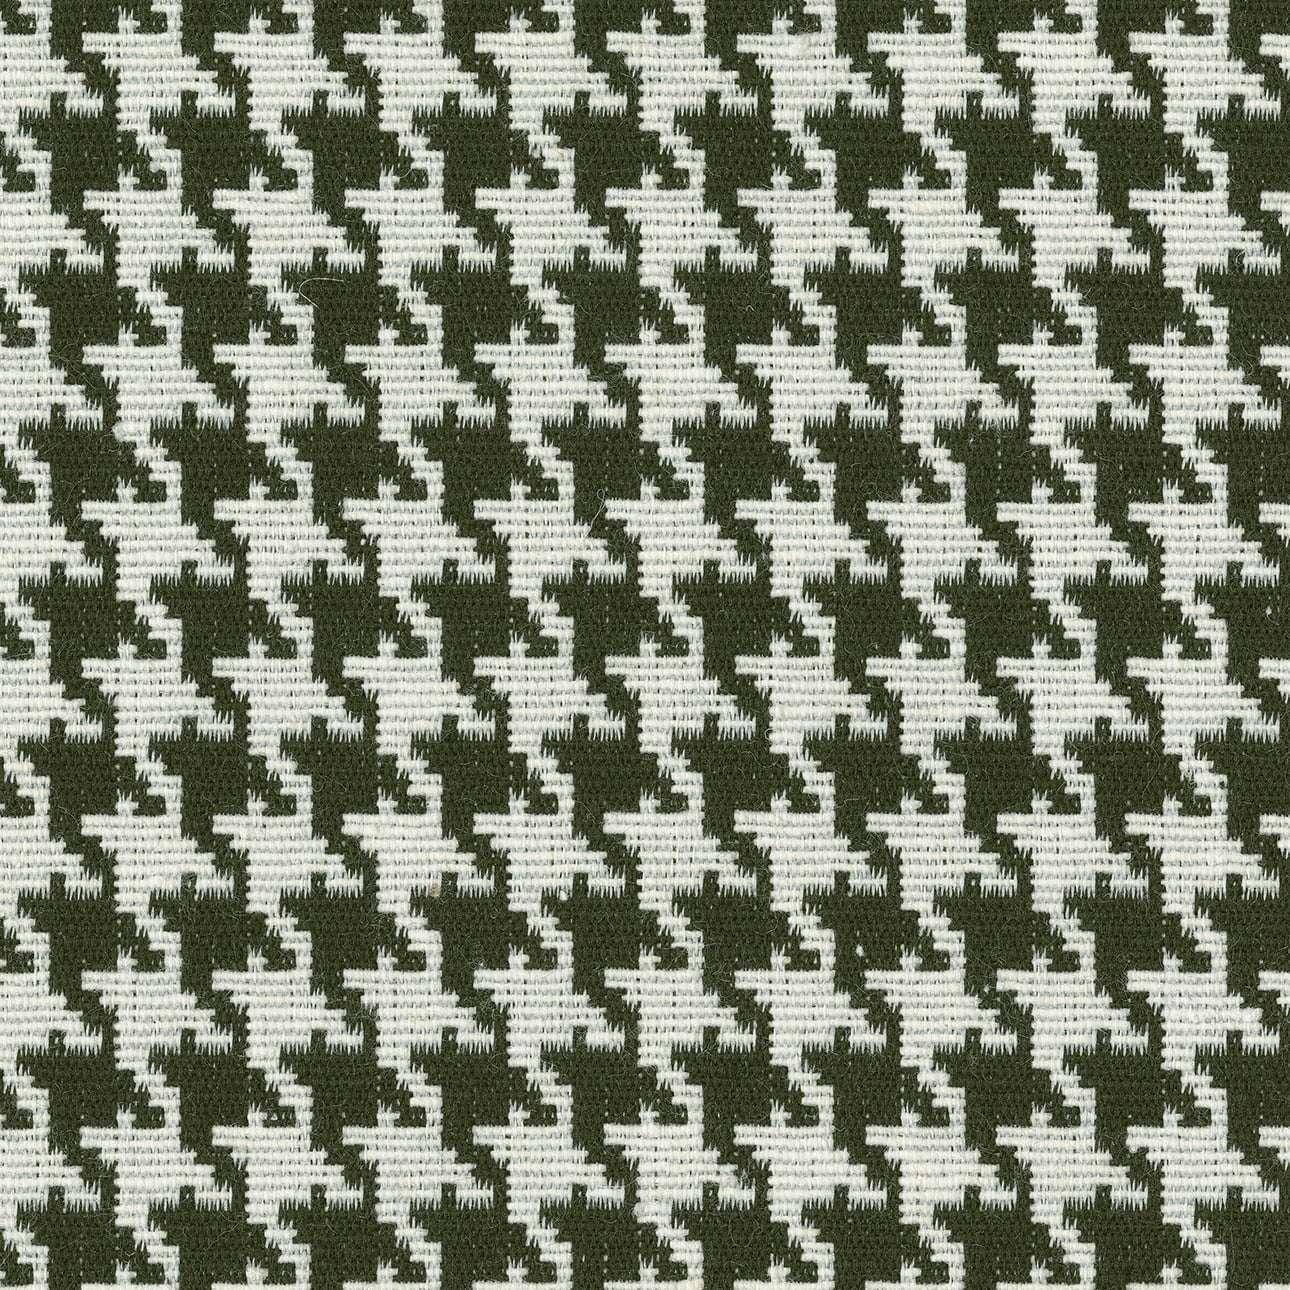 Rímska roleta Padva V kolekcii Black & White, tkanina: 142-77